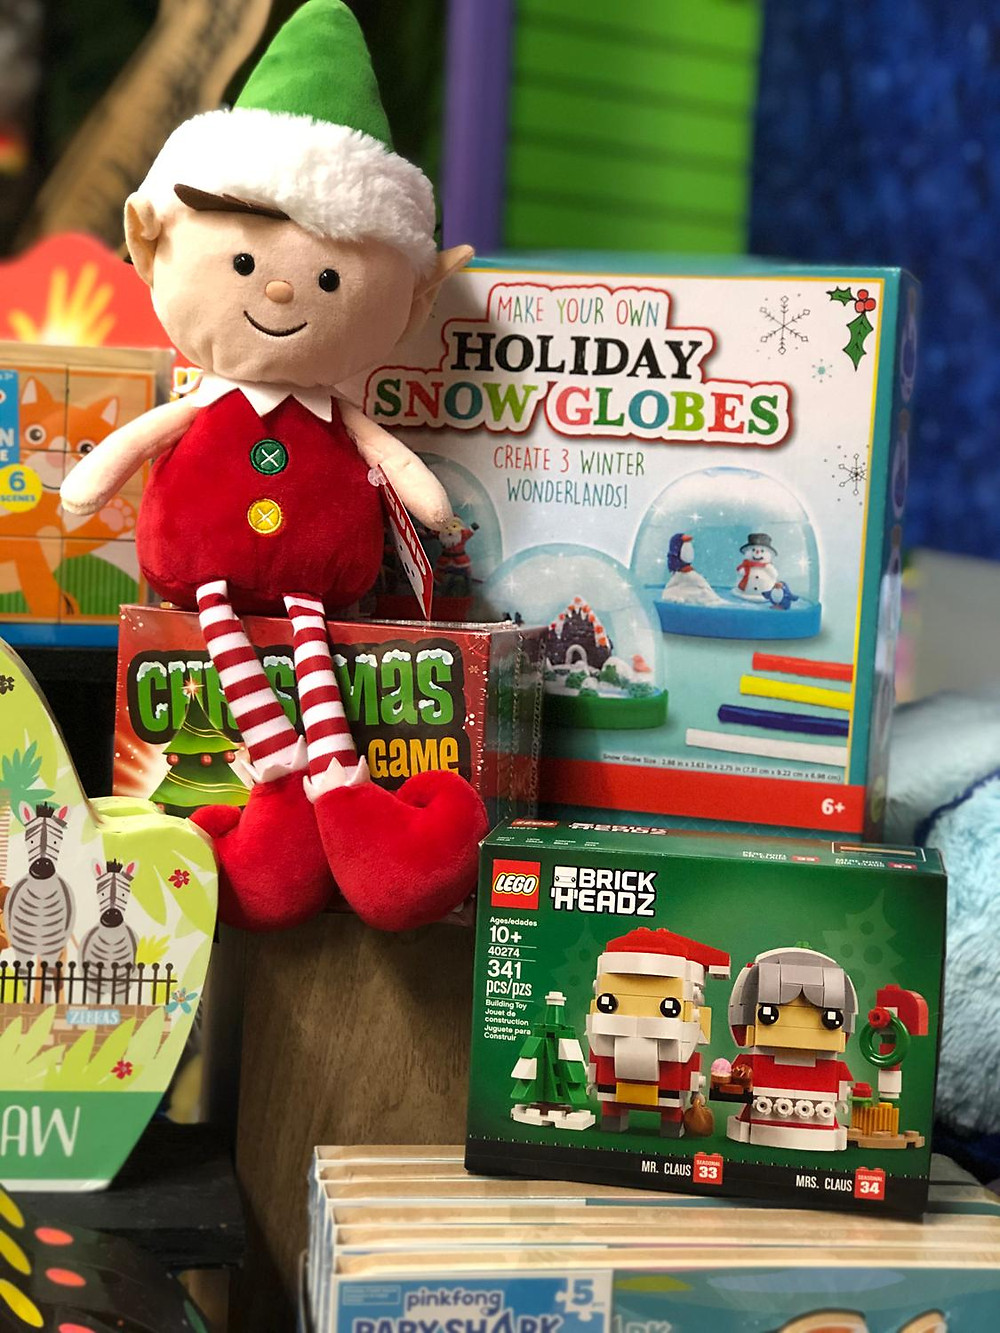 Elf plush, Lego Christmas sets, Winter crafts